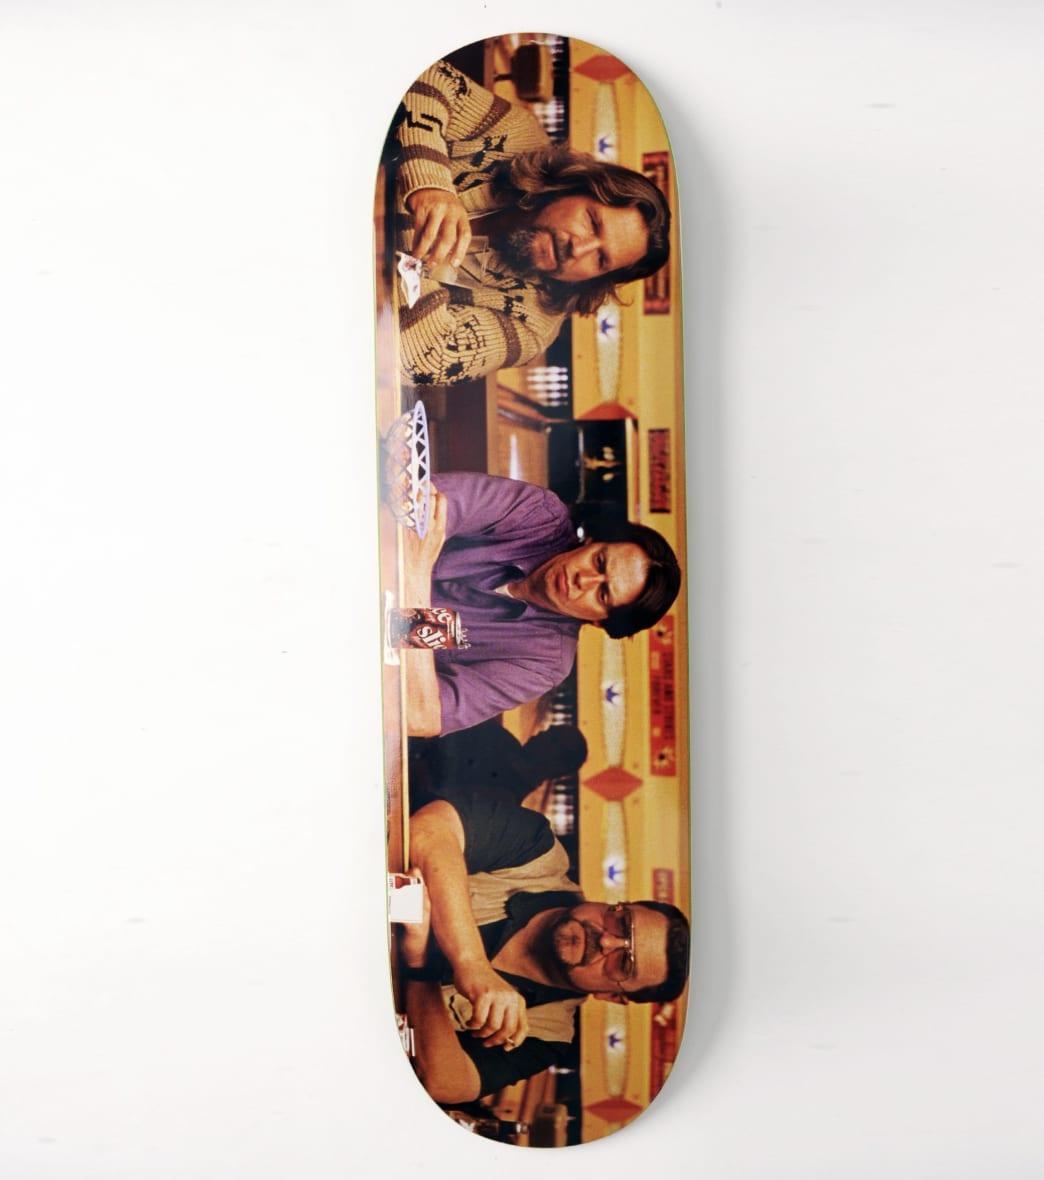 "Skateboard Cafe Bowling Skateboard Deck - 8.25"" | Deck by Skateboard Cafe 1"